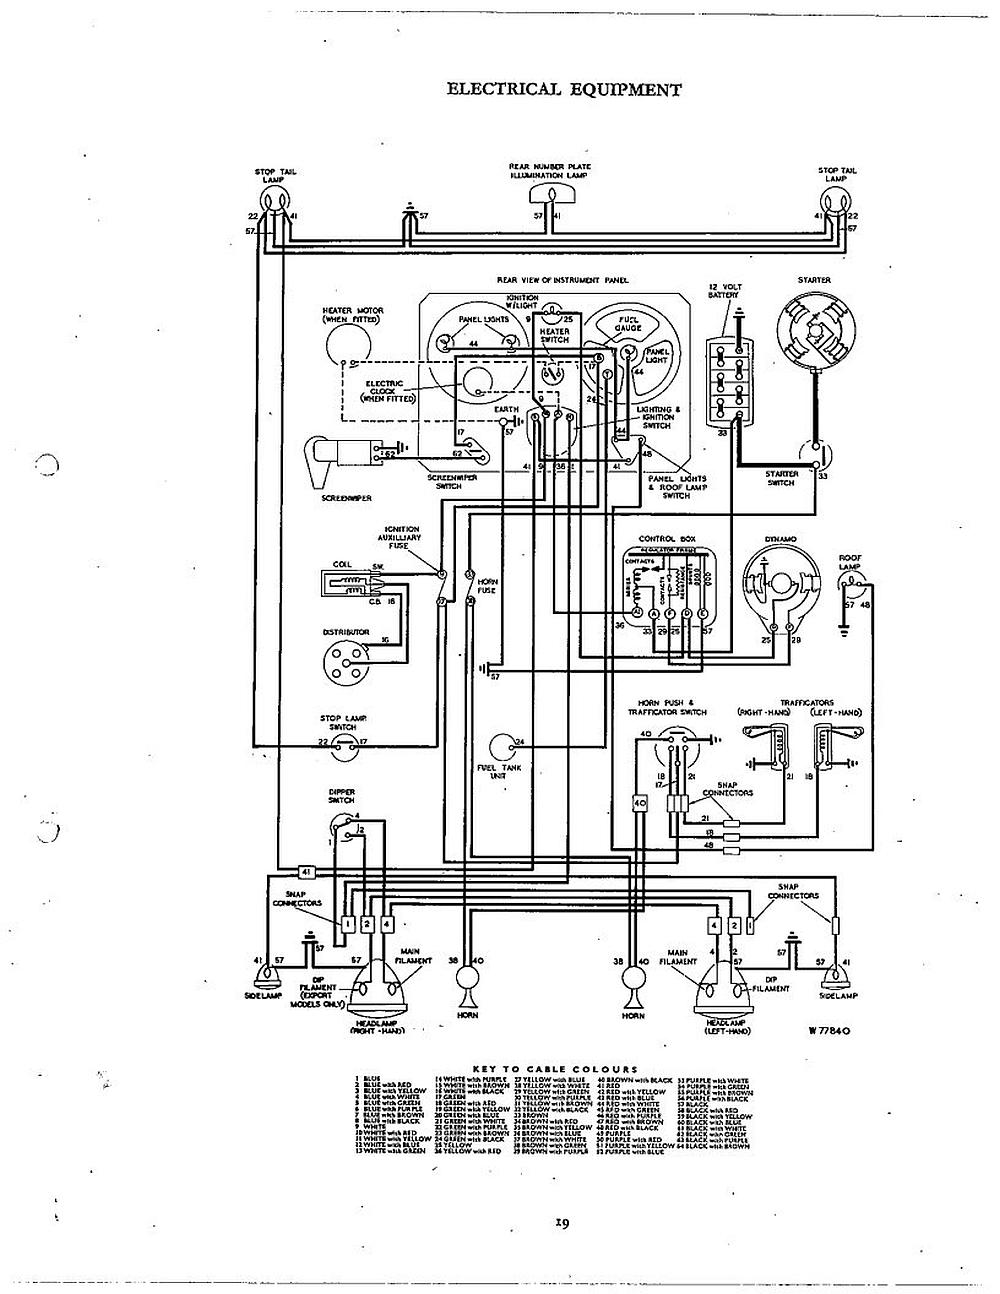 Diagram Wiring Diagrams Triumph Tr3a Full Version Hd Quality Triumph Tr3a Diagramsjames Radioueb It